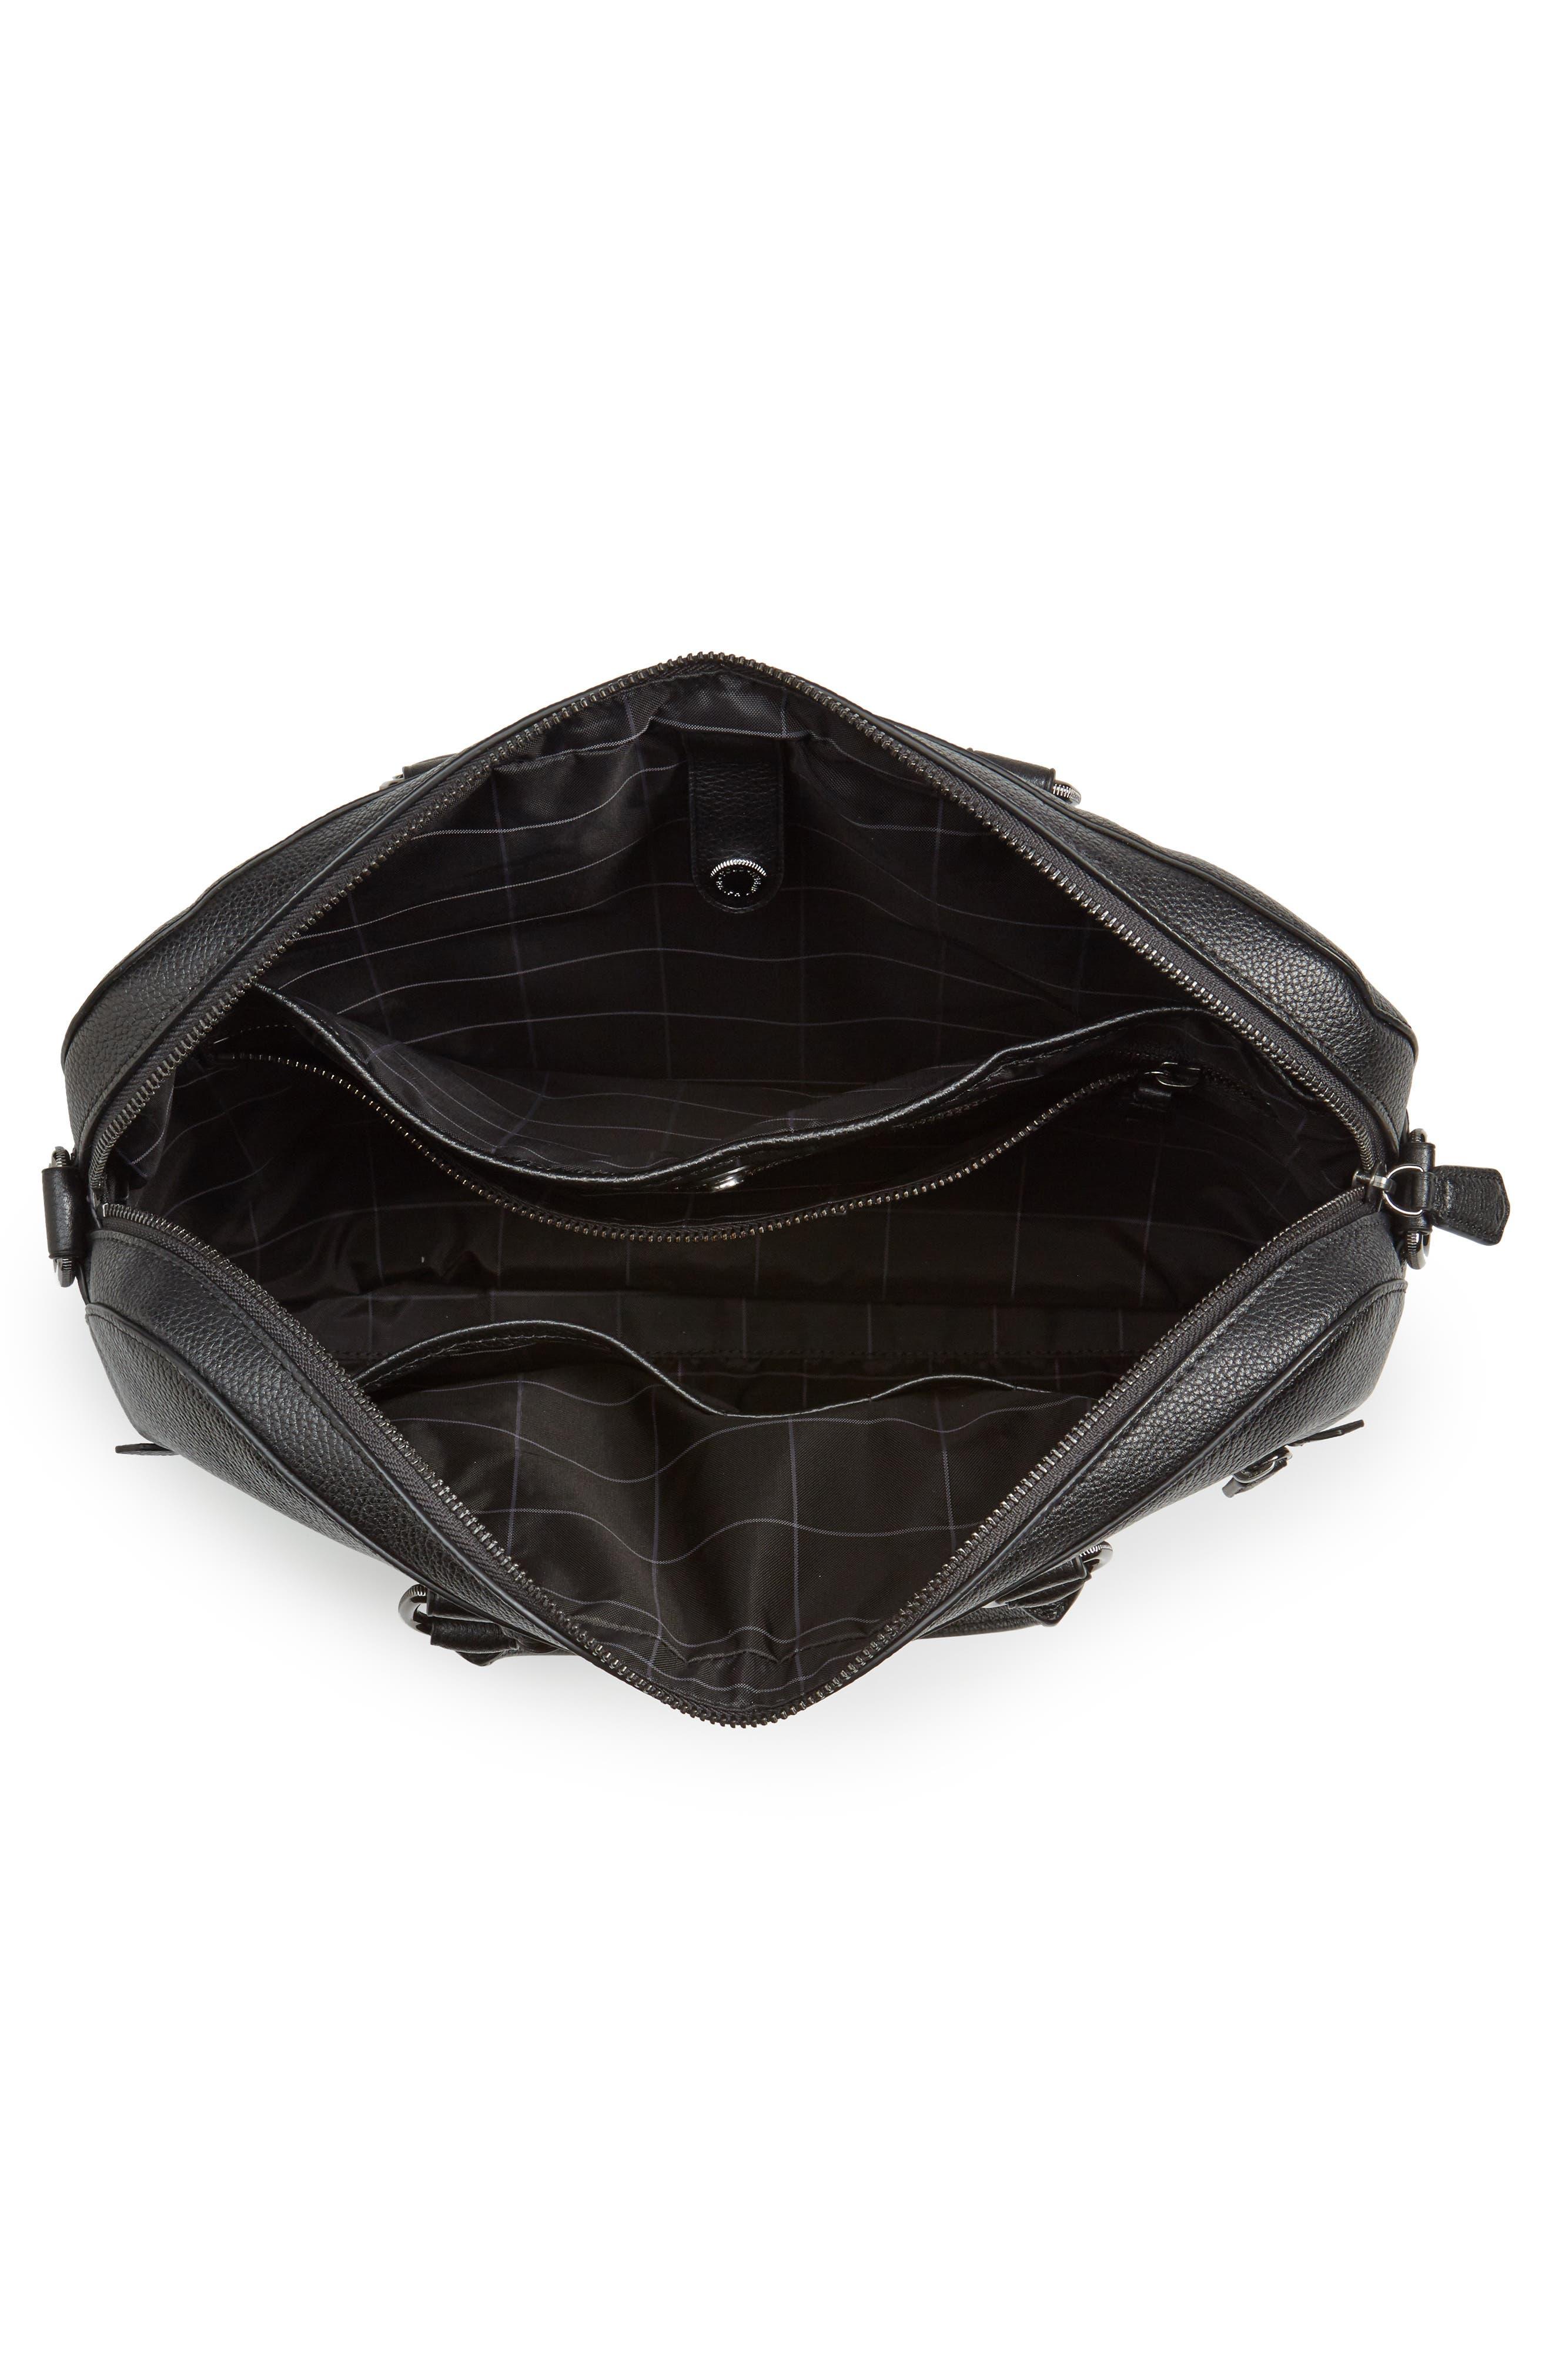 Commuter Leather Briefcase,                             Alternate thumbnail 4, color,                             Black